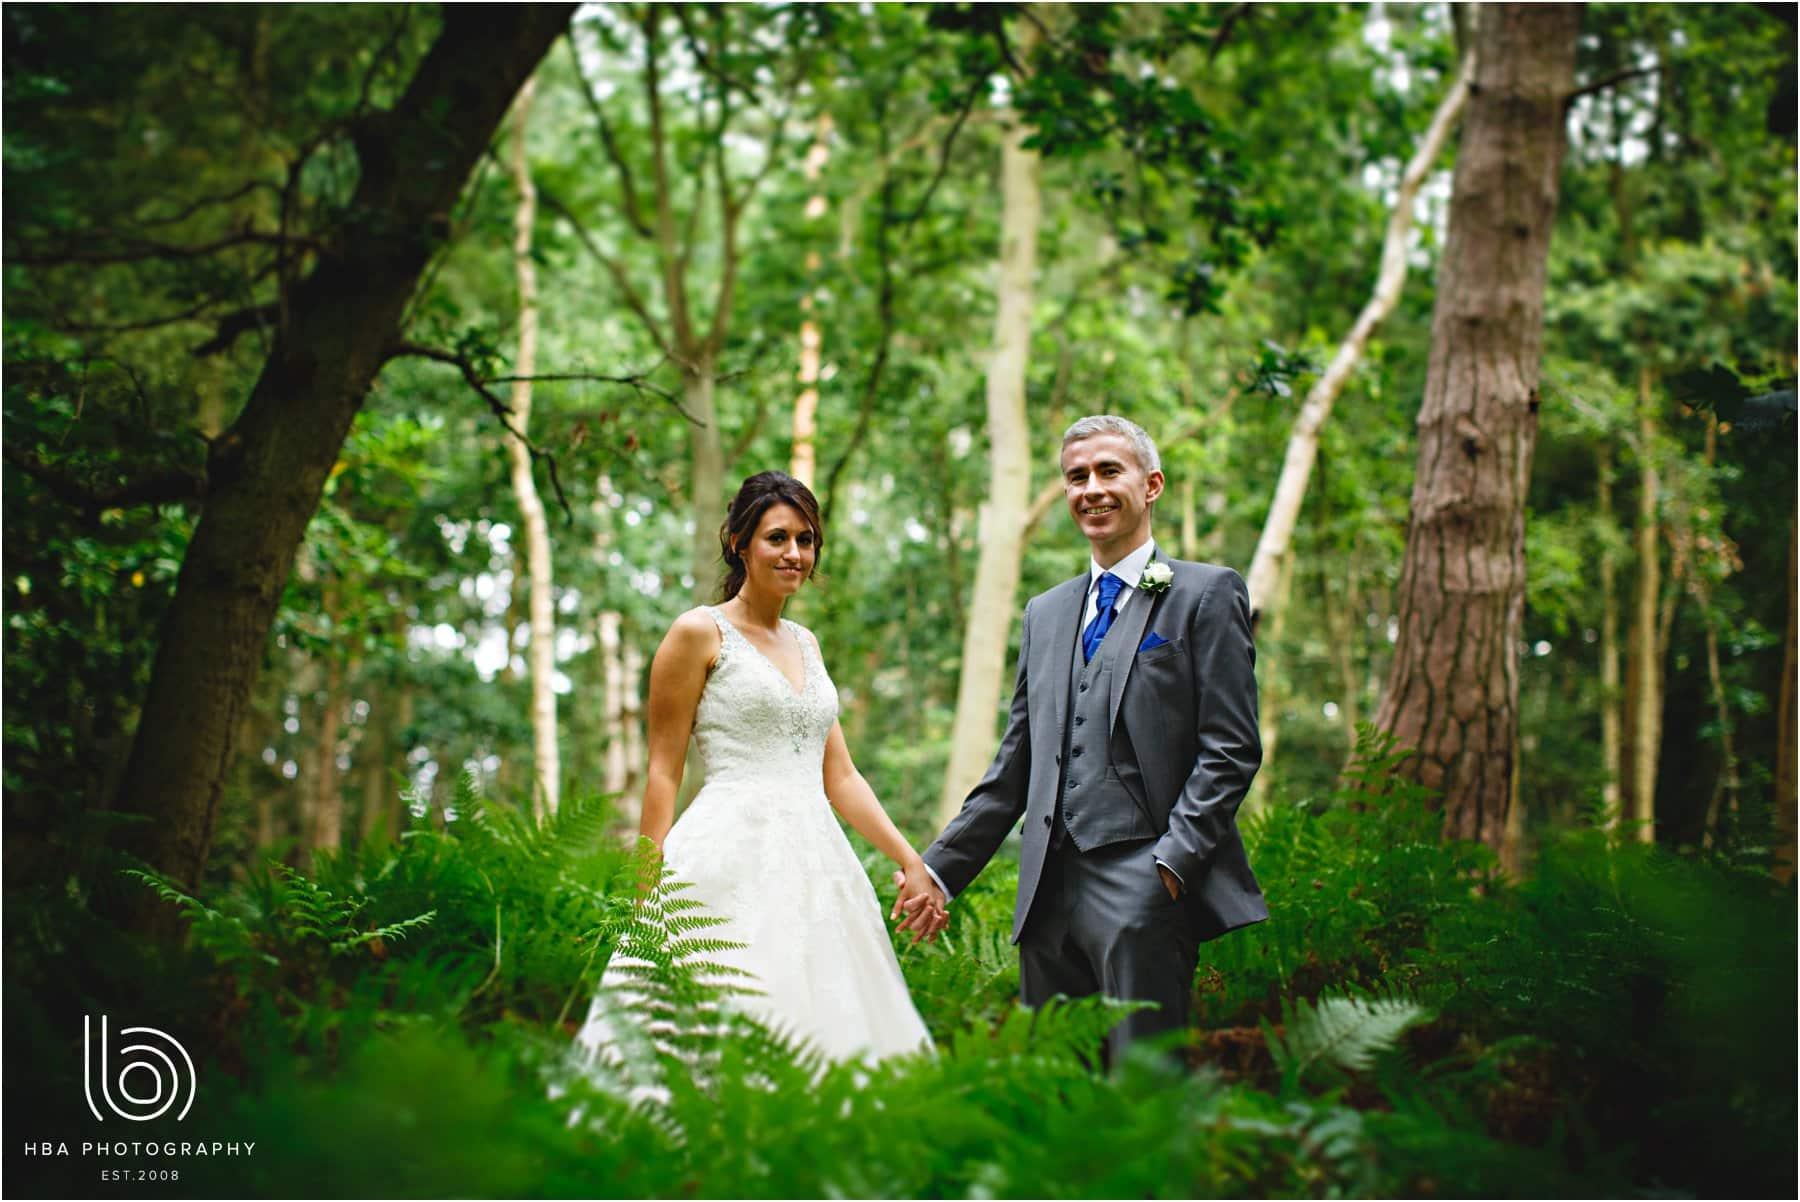 the bride & groom in the woods